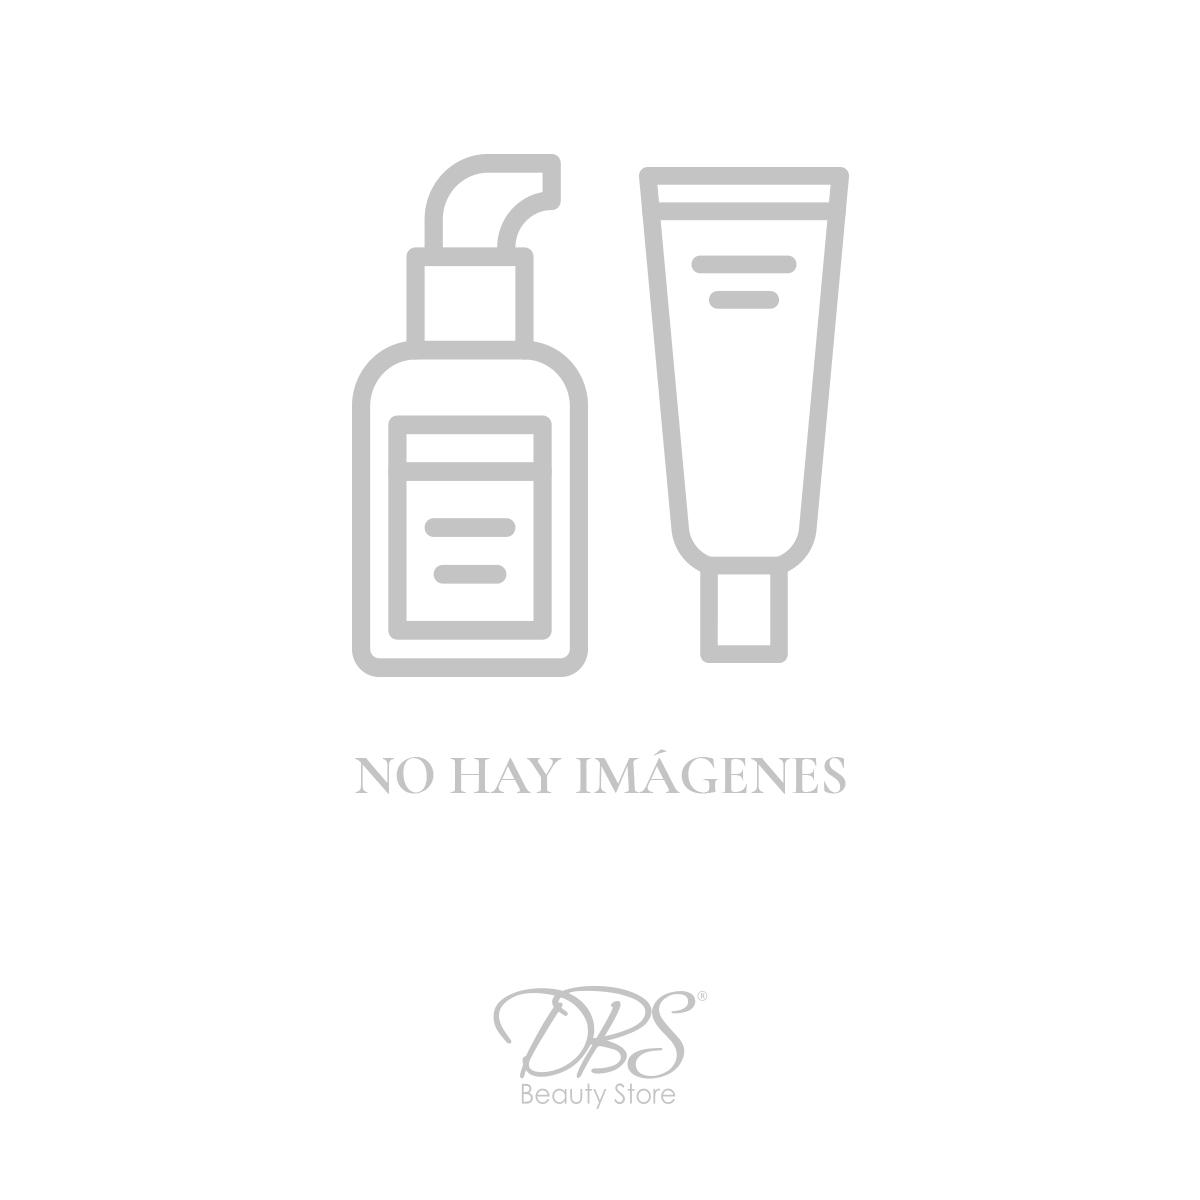 loreal-maquillaje-LO-00577.jpg